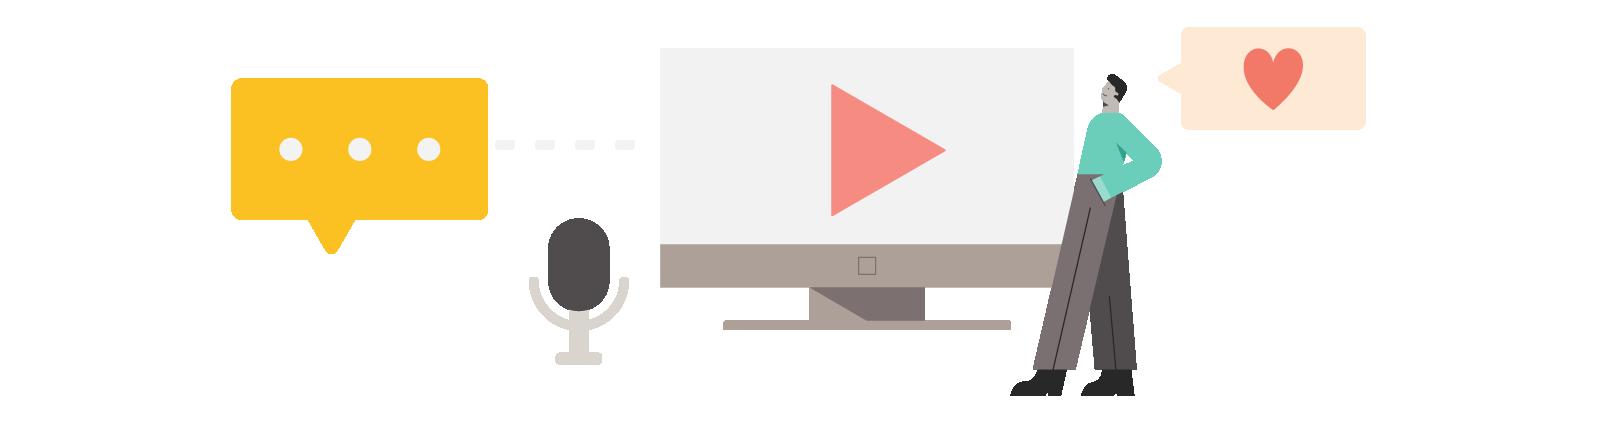 Videos on Watch